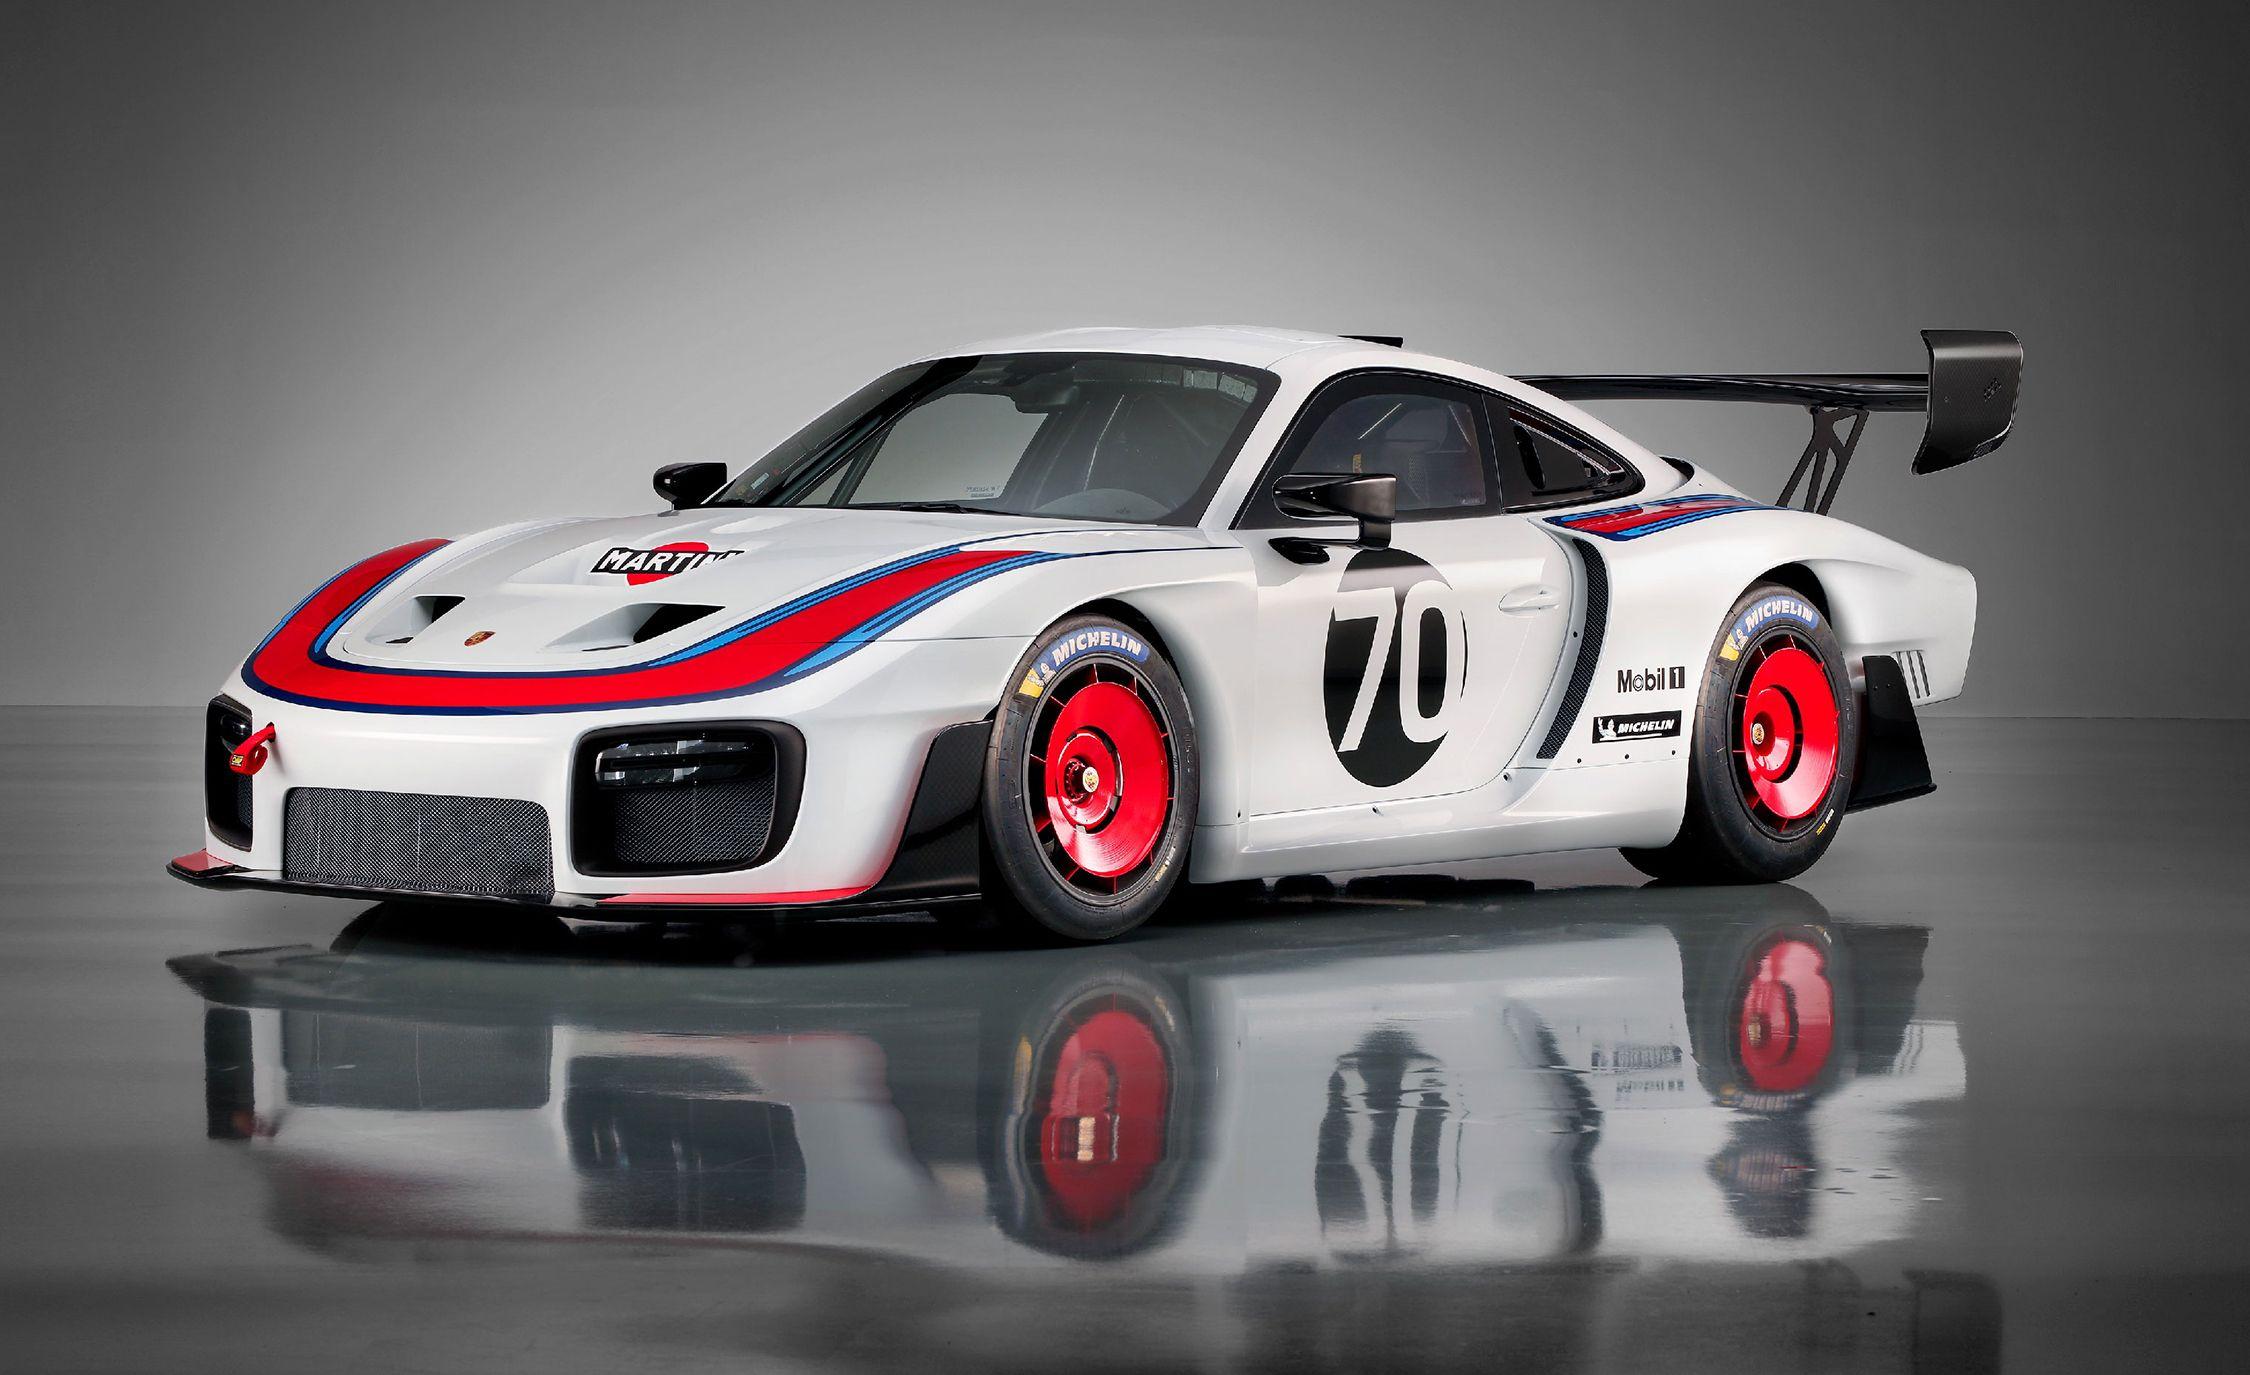 Porsche 935 Race Car Brings Back an Iconic Name